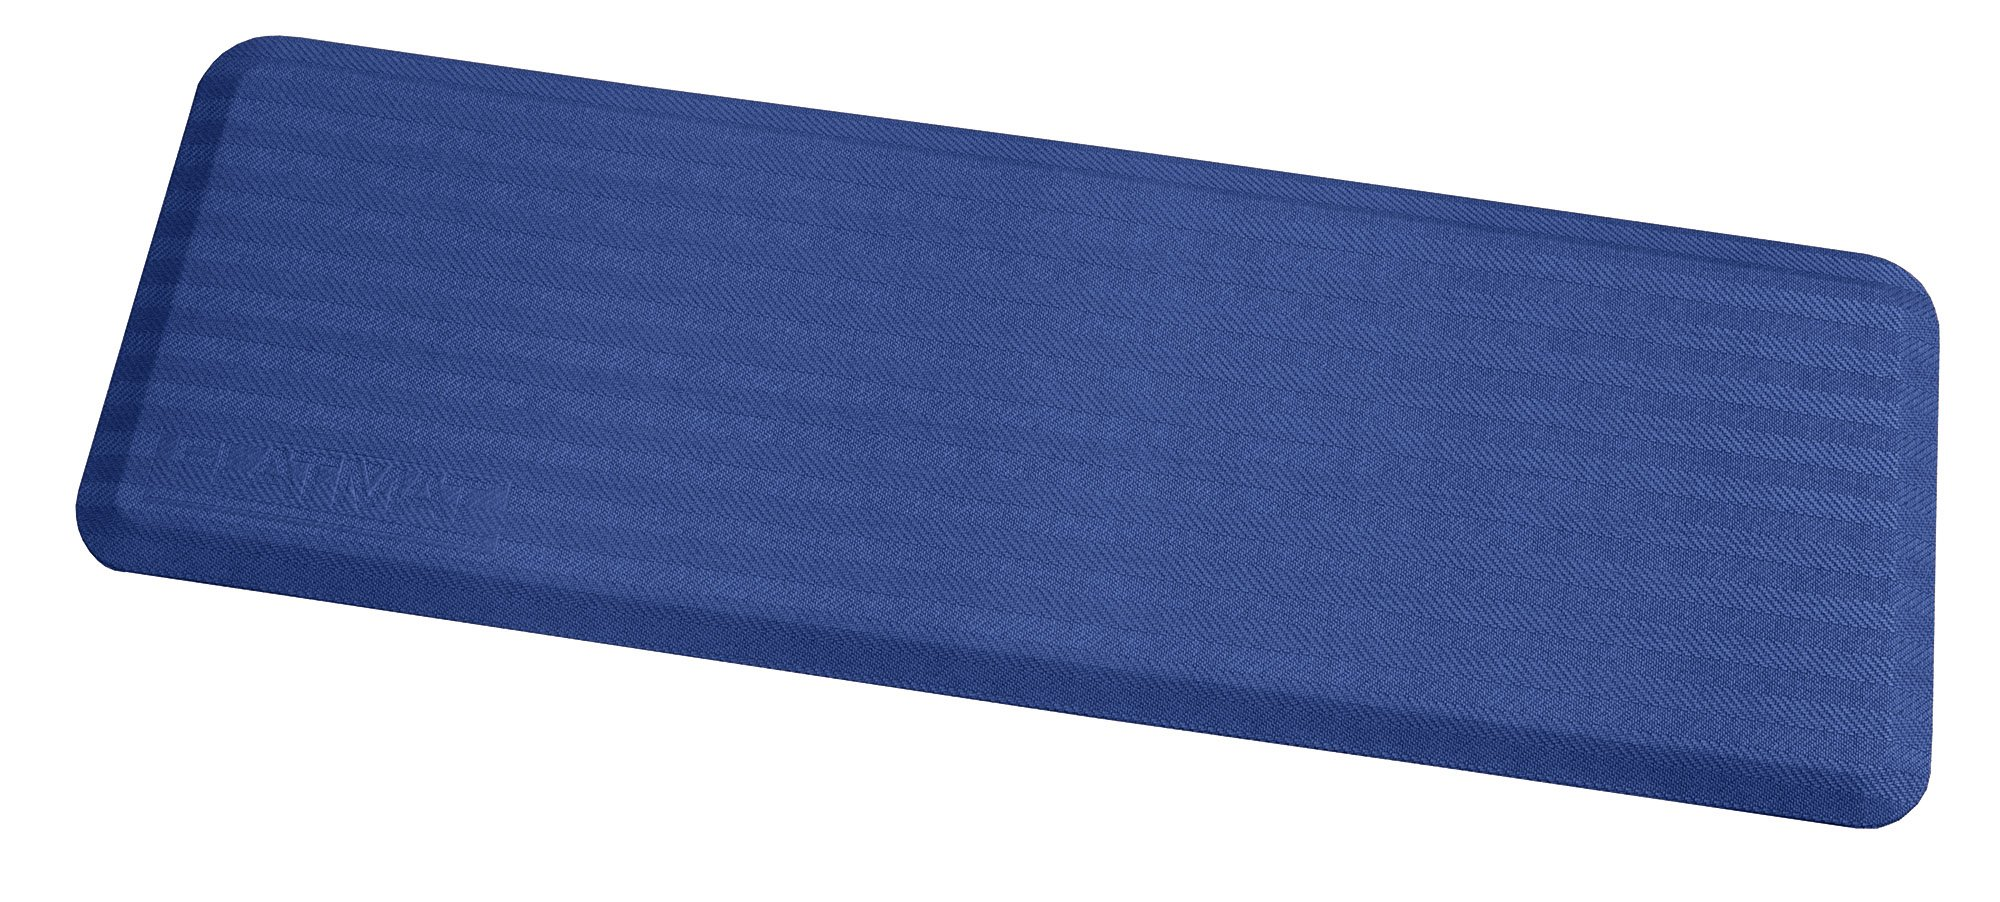 Arrowhead Healthcare Supply P-107350-24-07 FLATMAT, 24'' Wide, Bedside Fall Mat, Blue, Woven Pattern